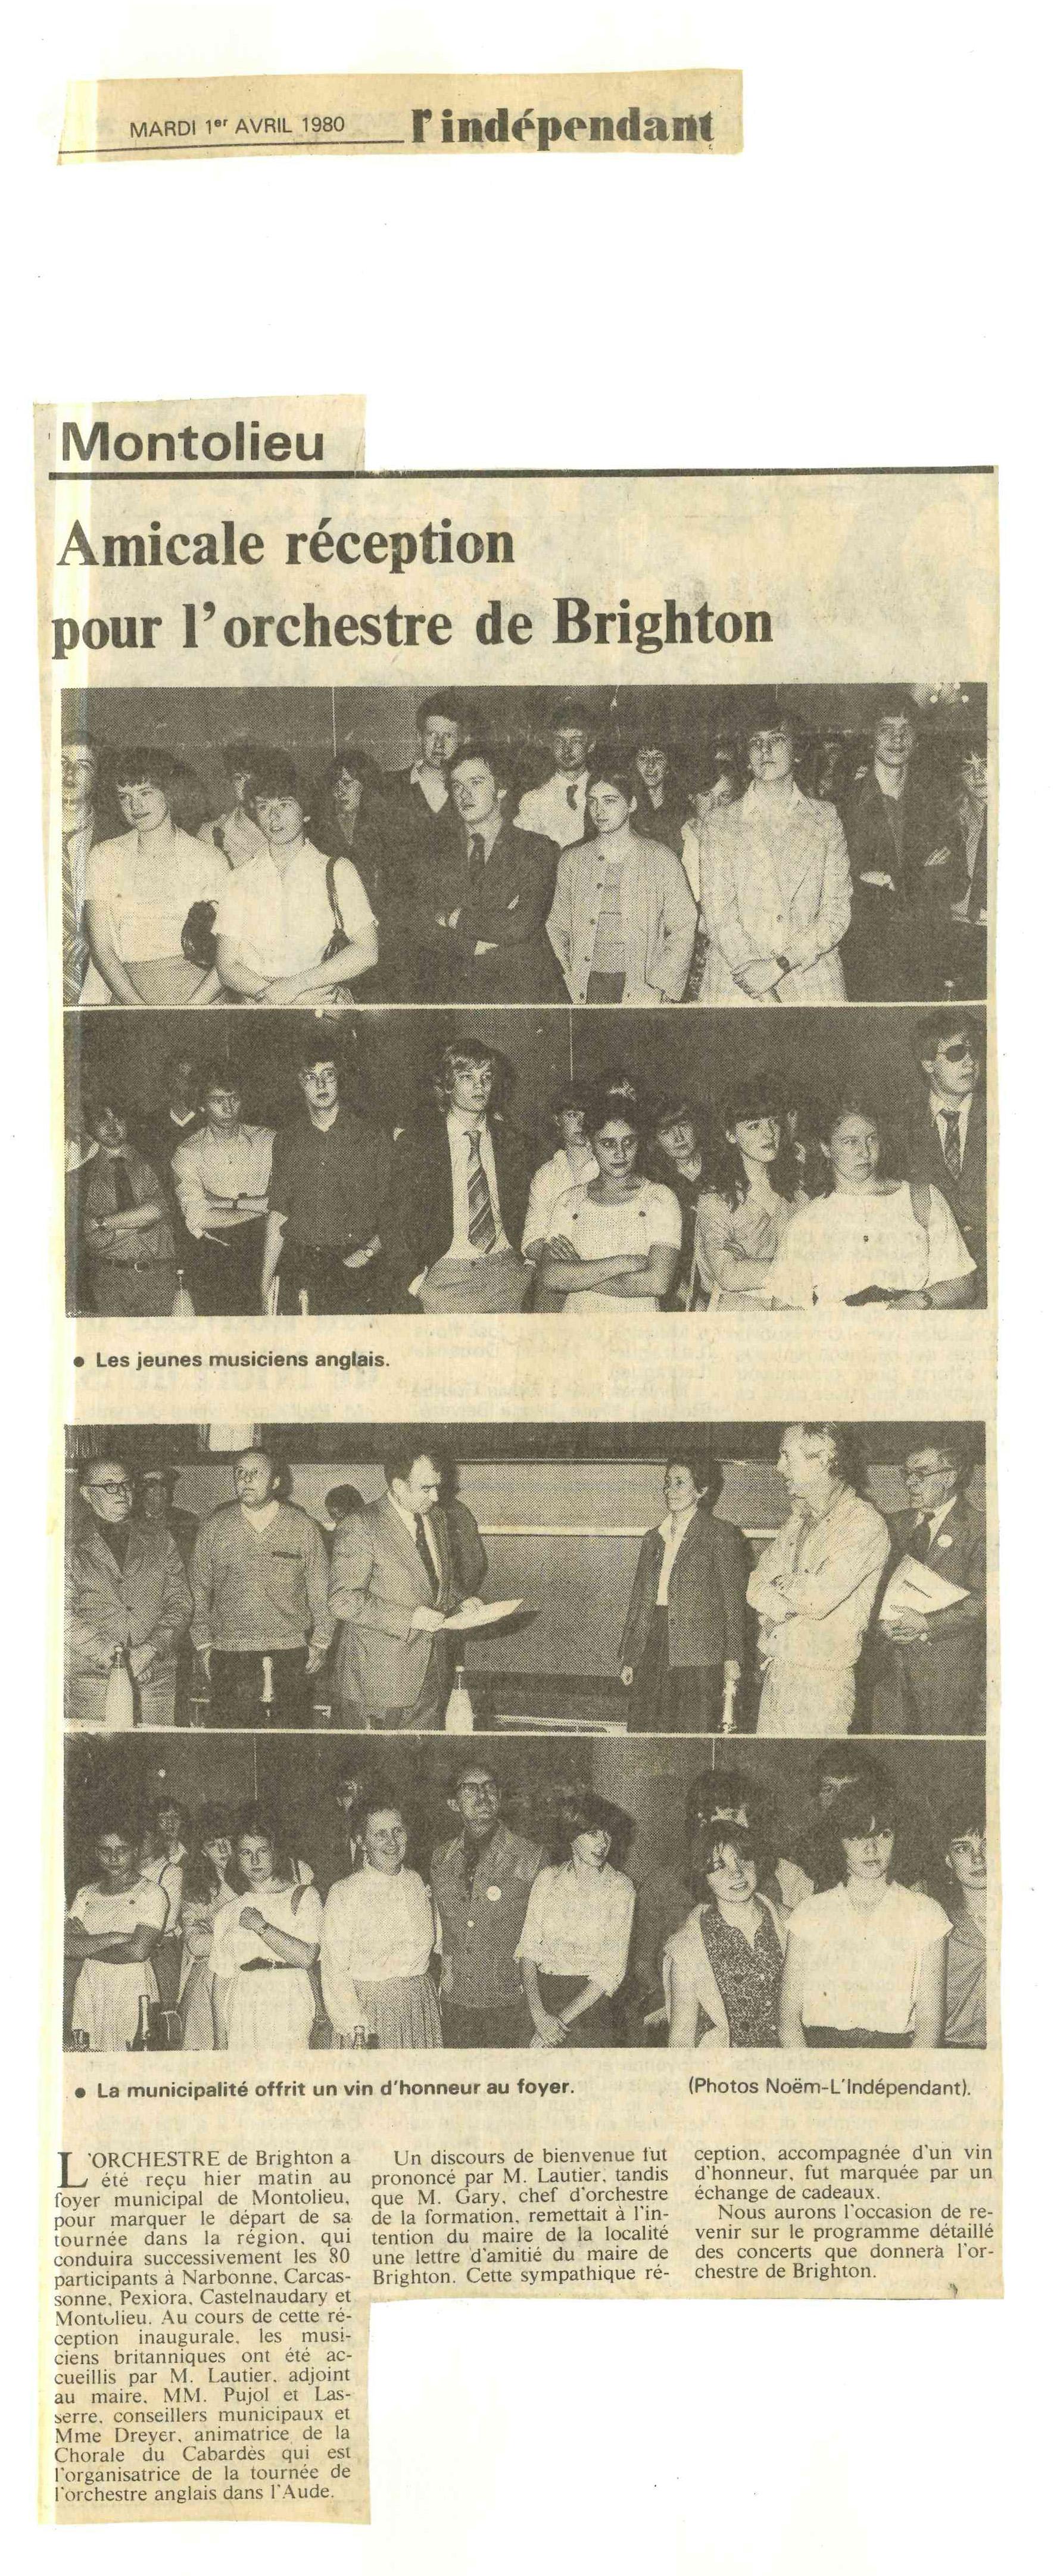 00194-L'independant, 1st April, 1980.jpg